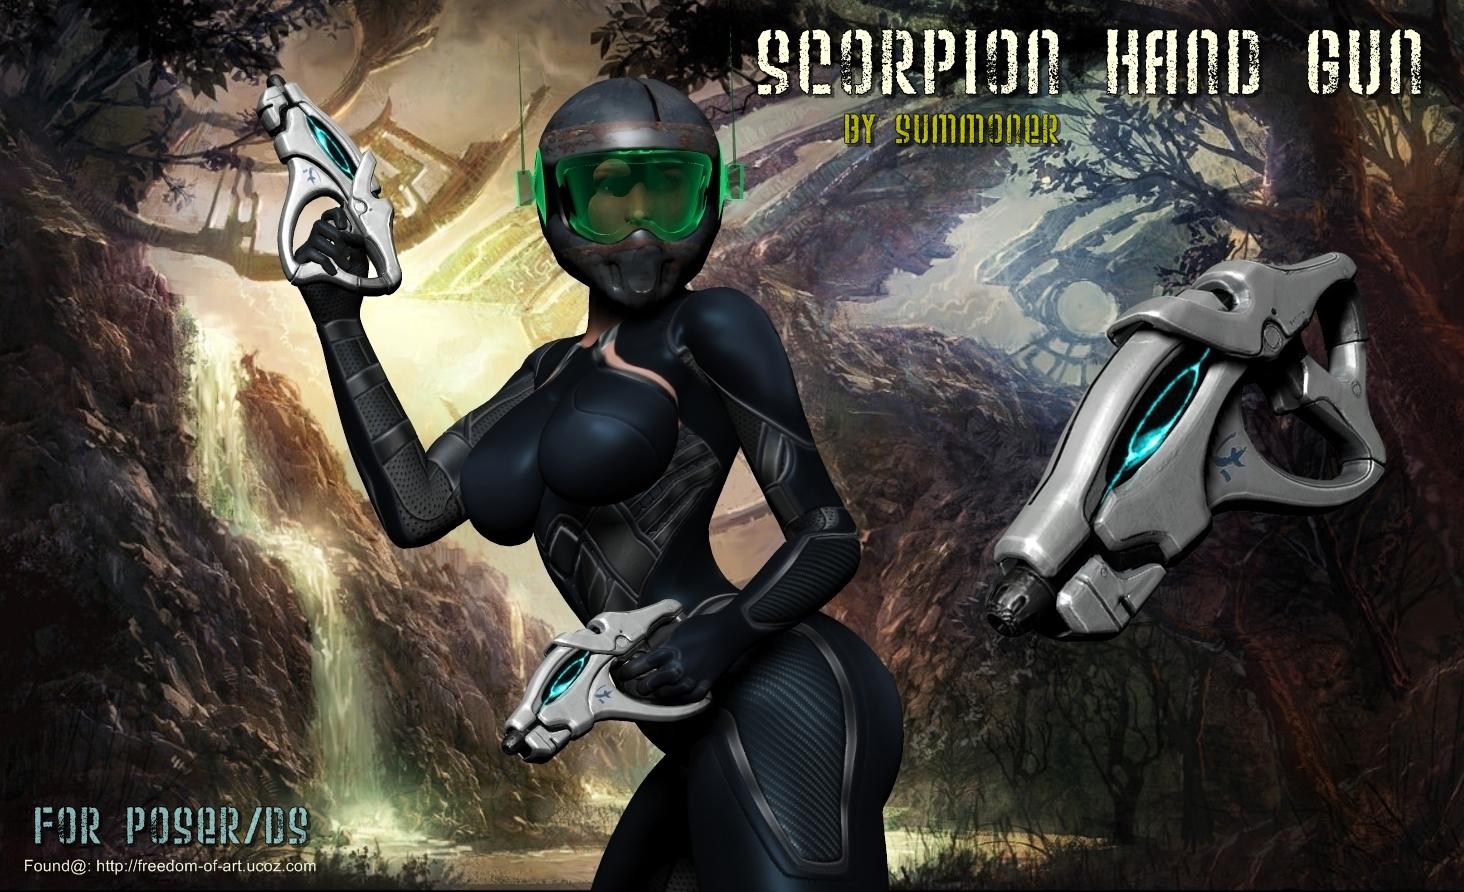 Scorpion Gun